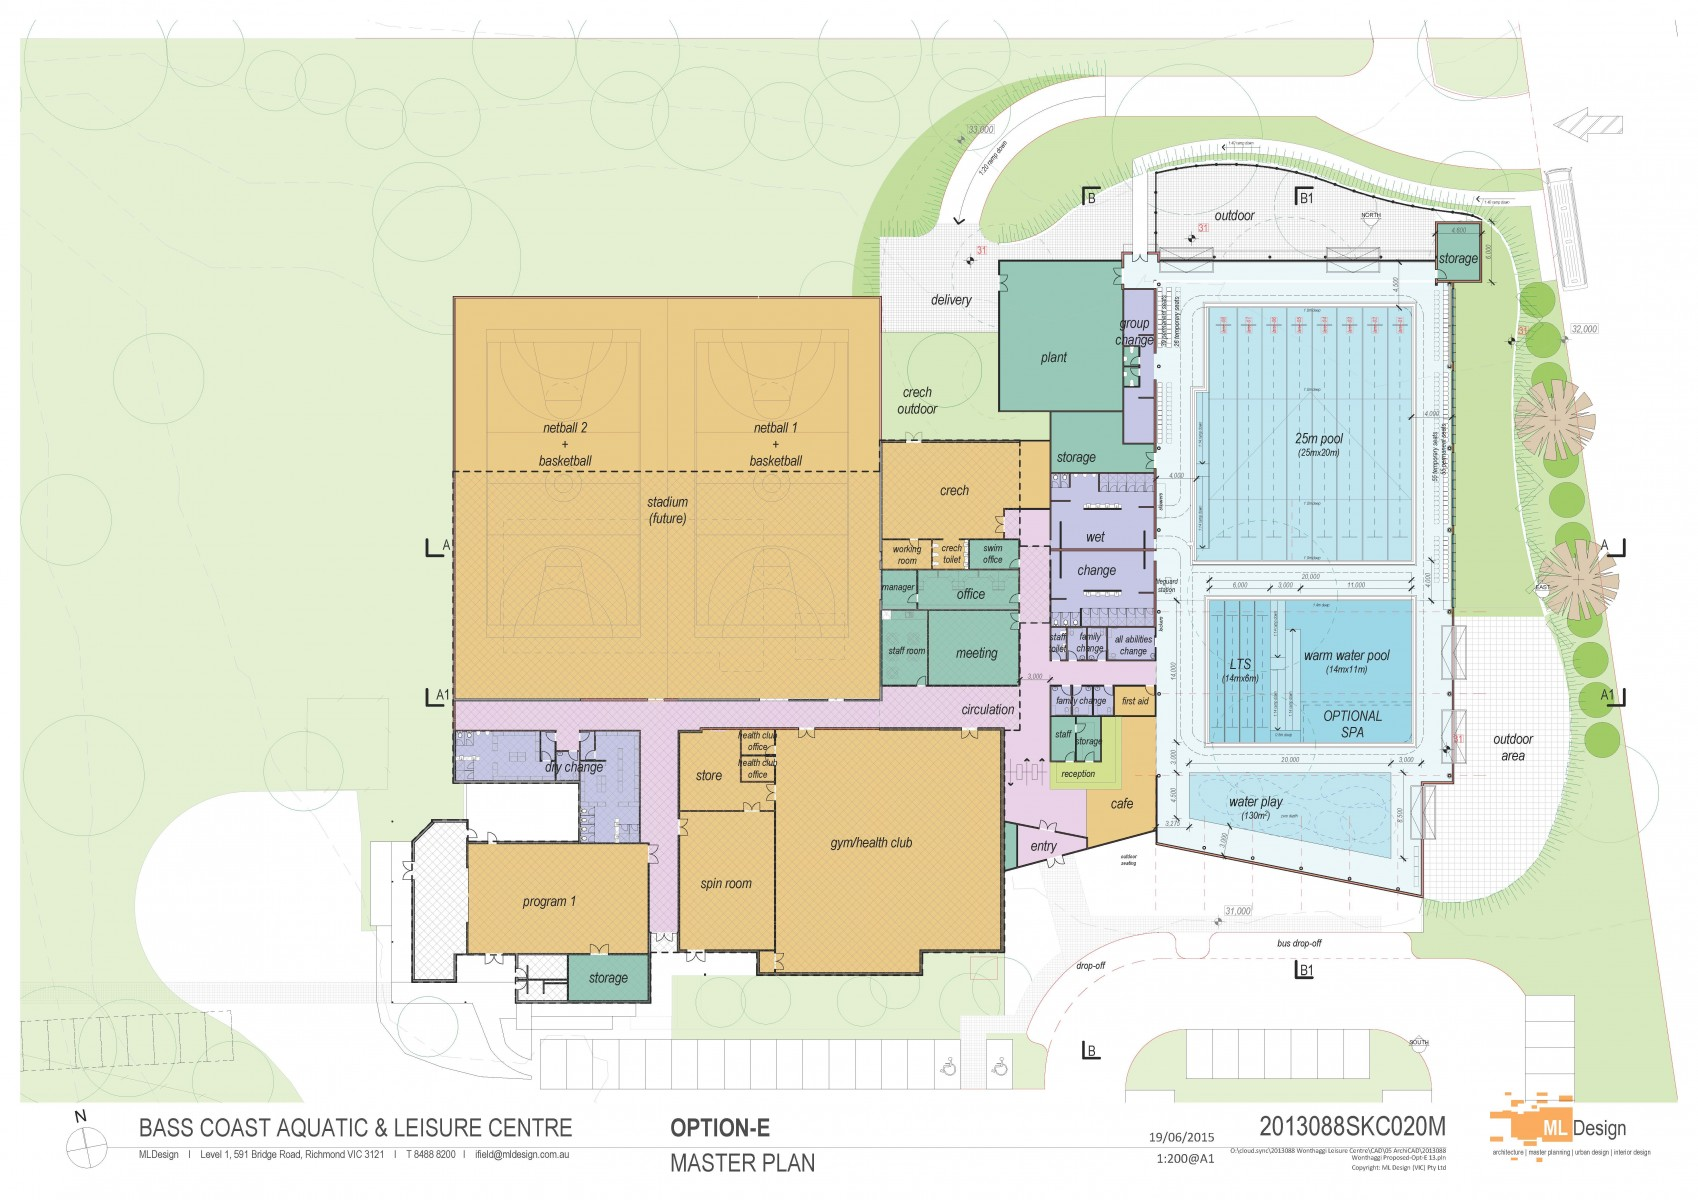 Council Adopts Master Plan For Aquatic Centre